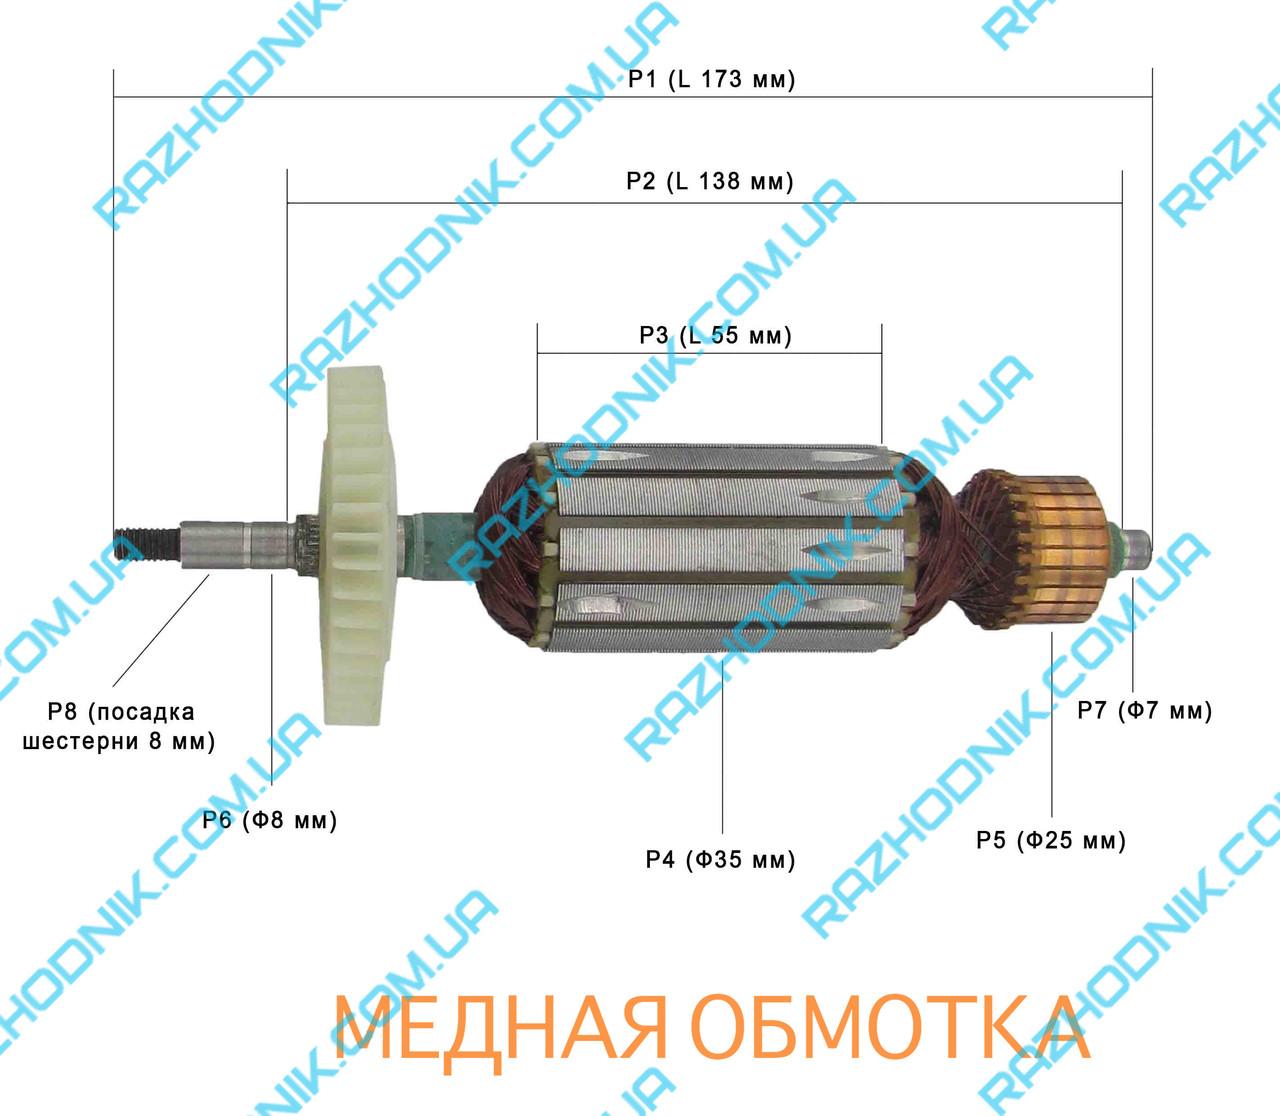 Якорь на болгарку Интерскол УШМ-125/1100 Э